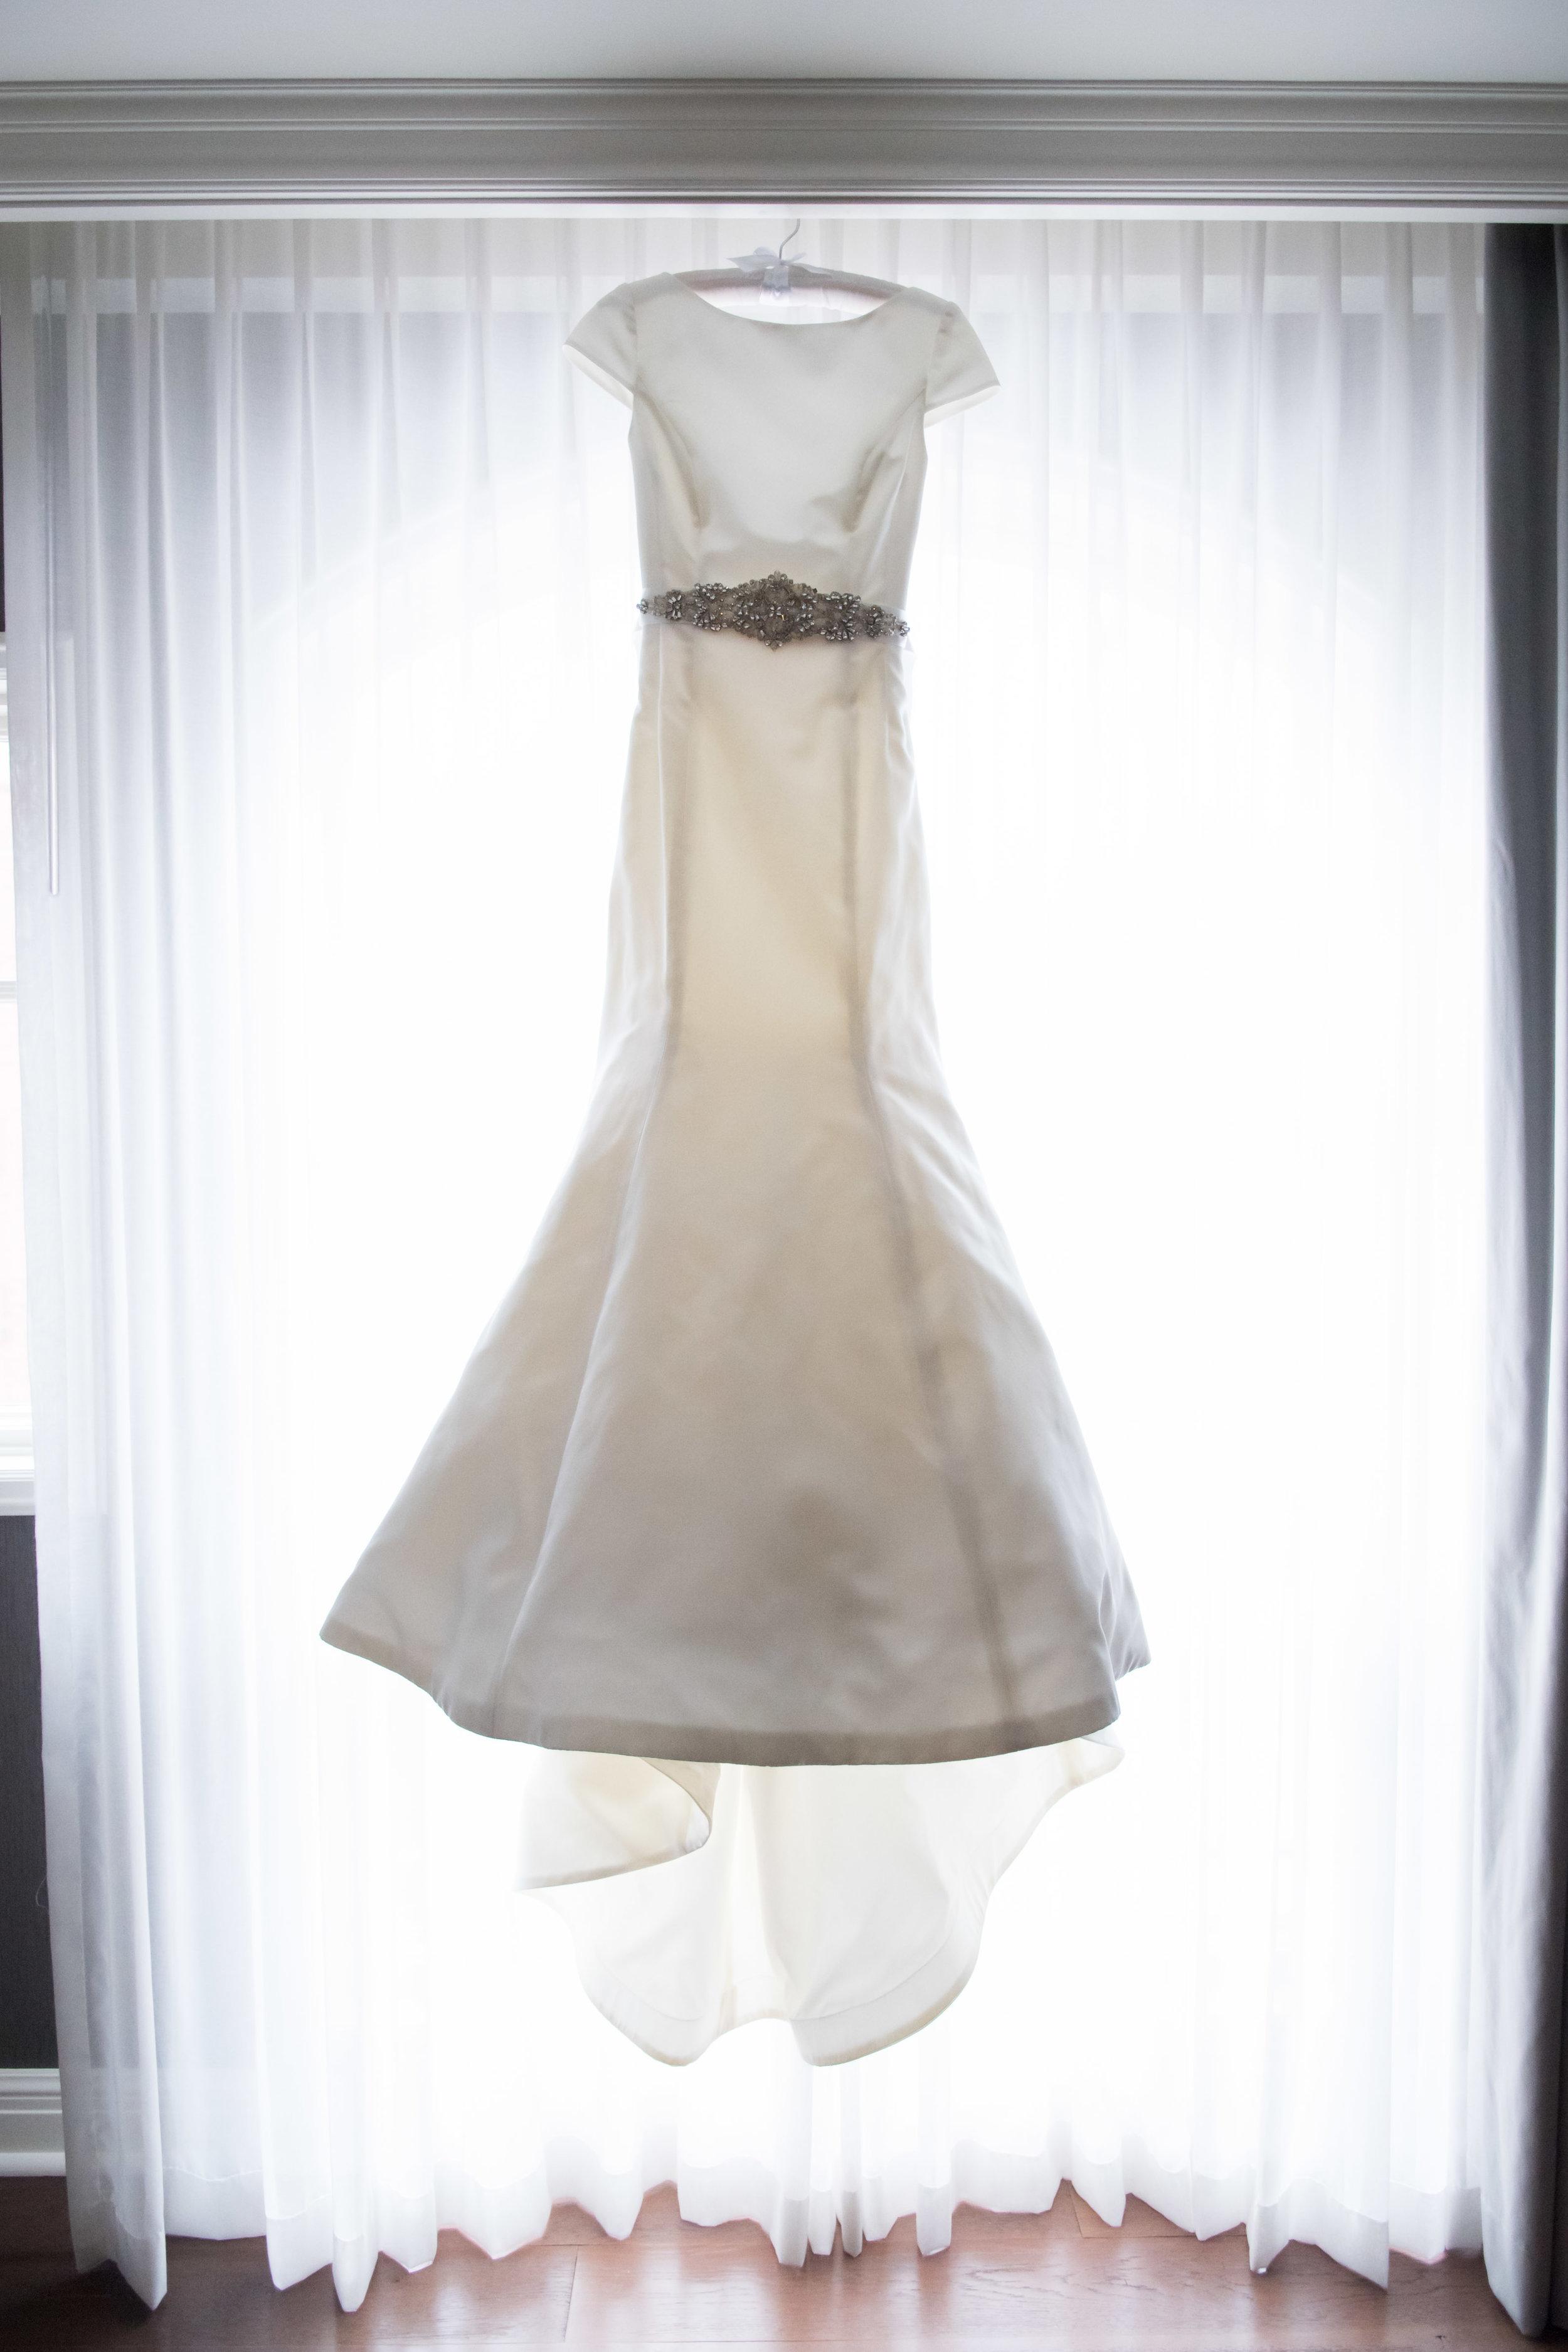 White Wedding Dress Hanging in Window